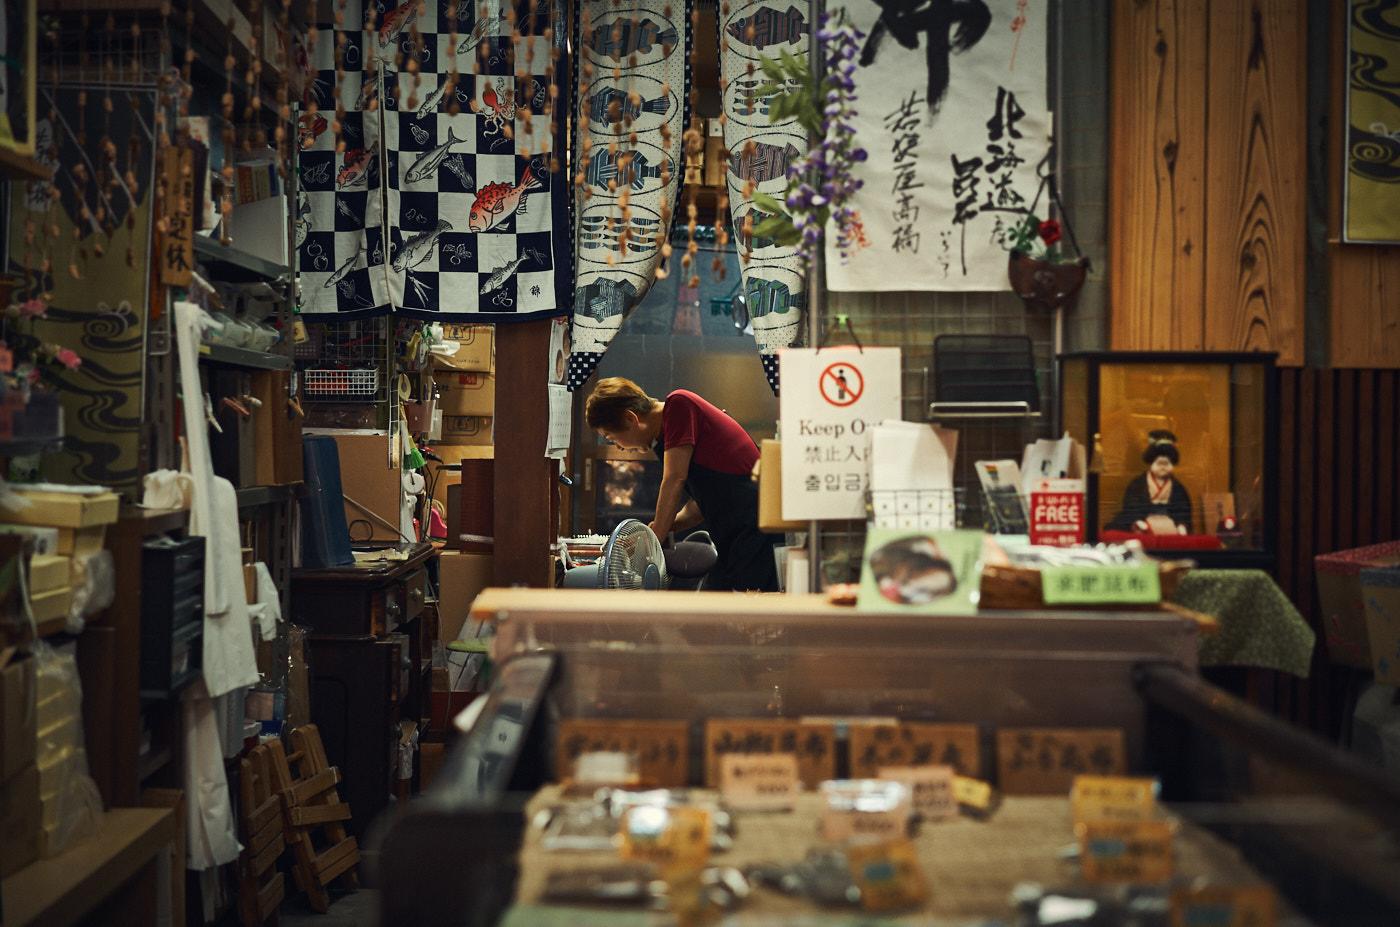 japan_2018_kyoto_raw 193_klein 1.jpg